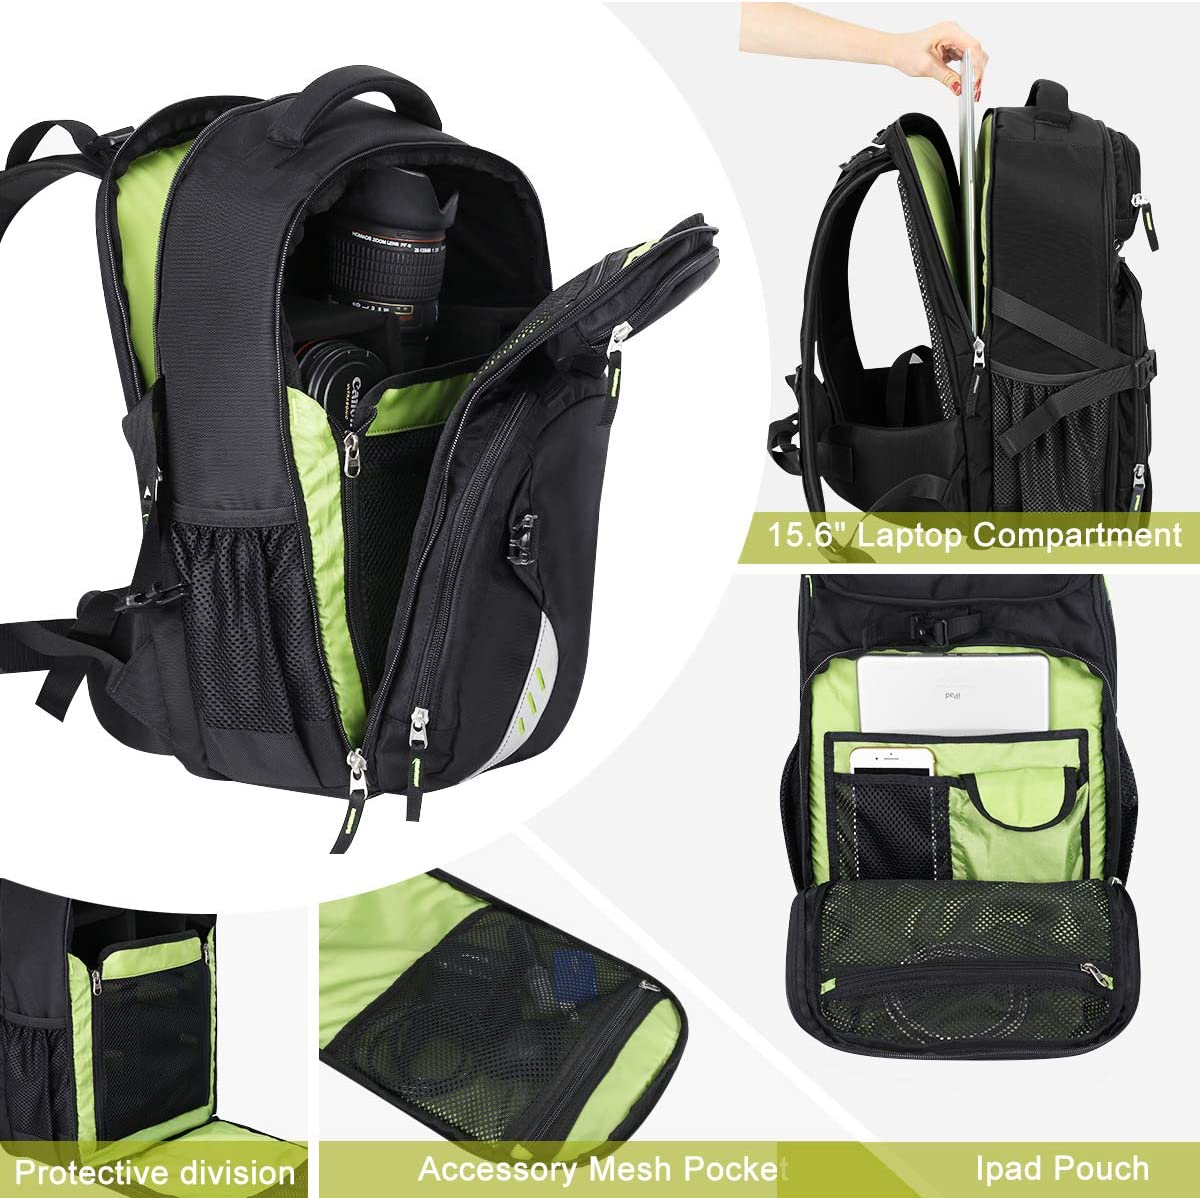 3-5 Lenses Endurax Video Camera Backpack Fit 2 DSLR//SLR Camera 15.6 inch Laptop for Outdoor Travel Grey